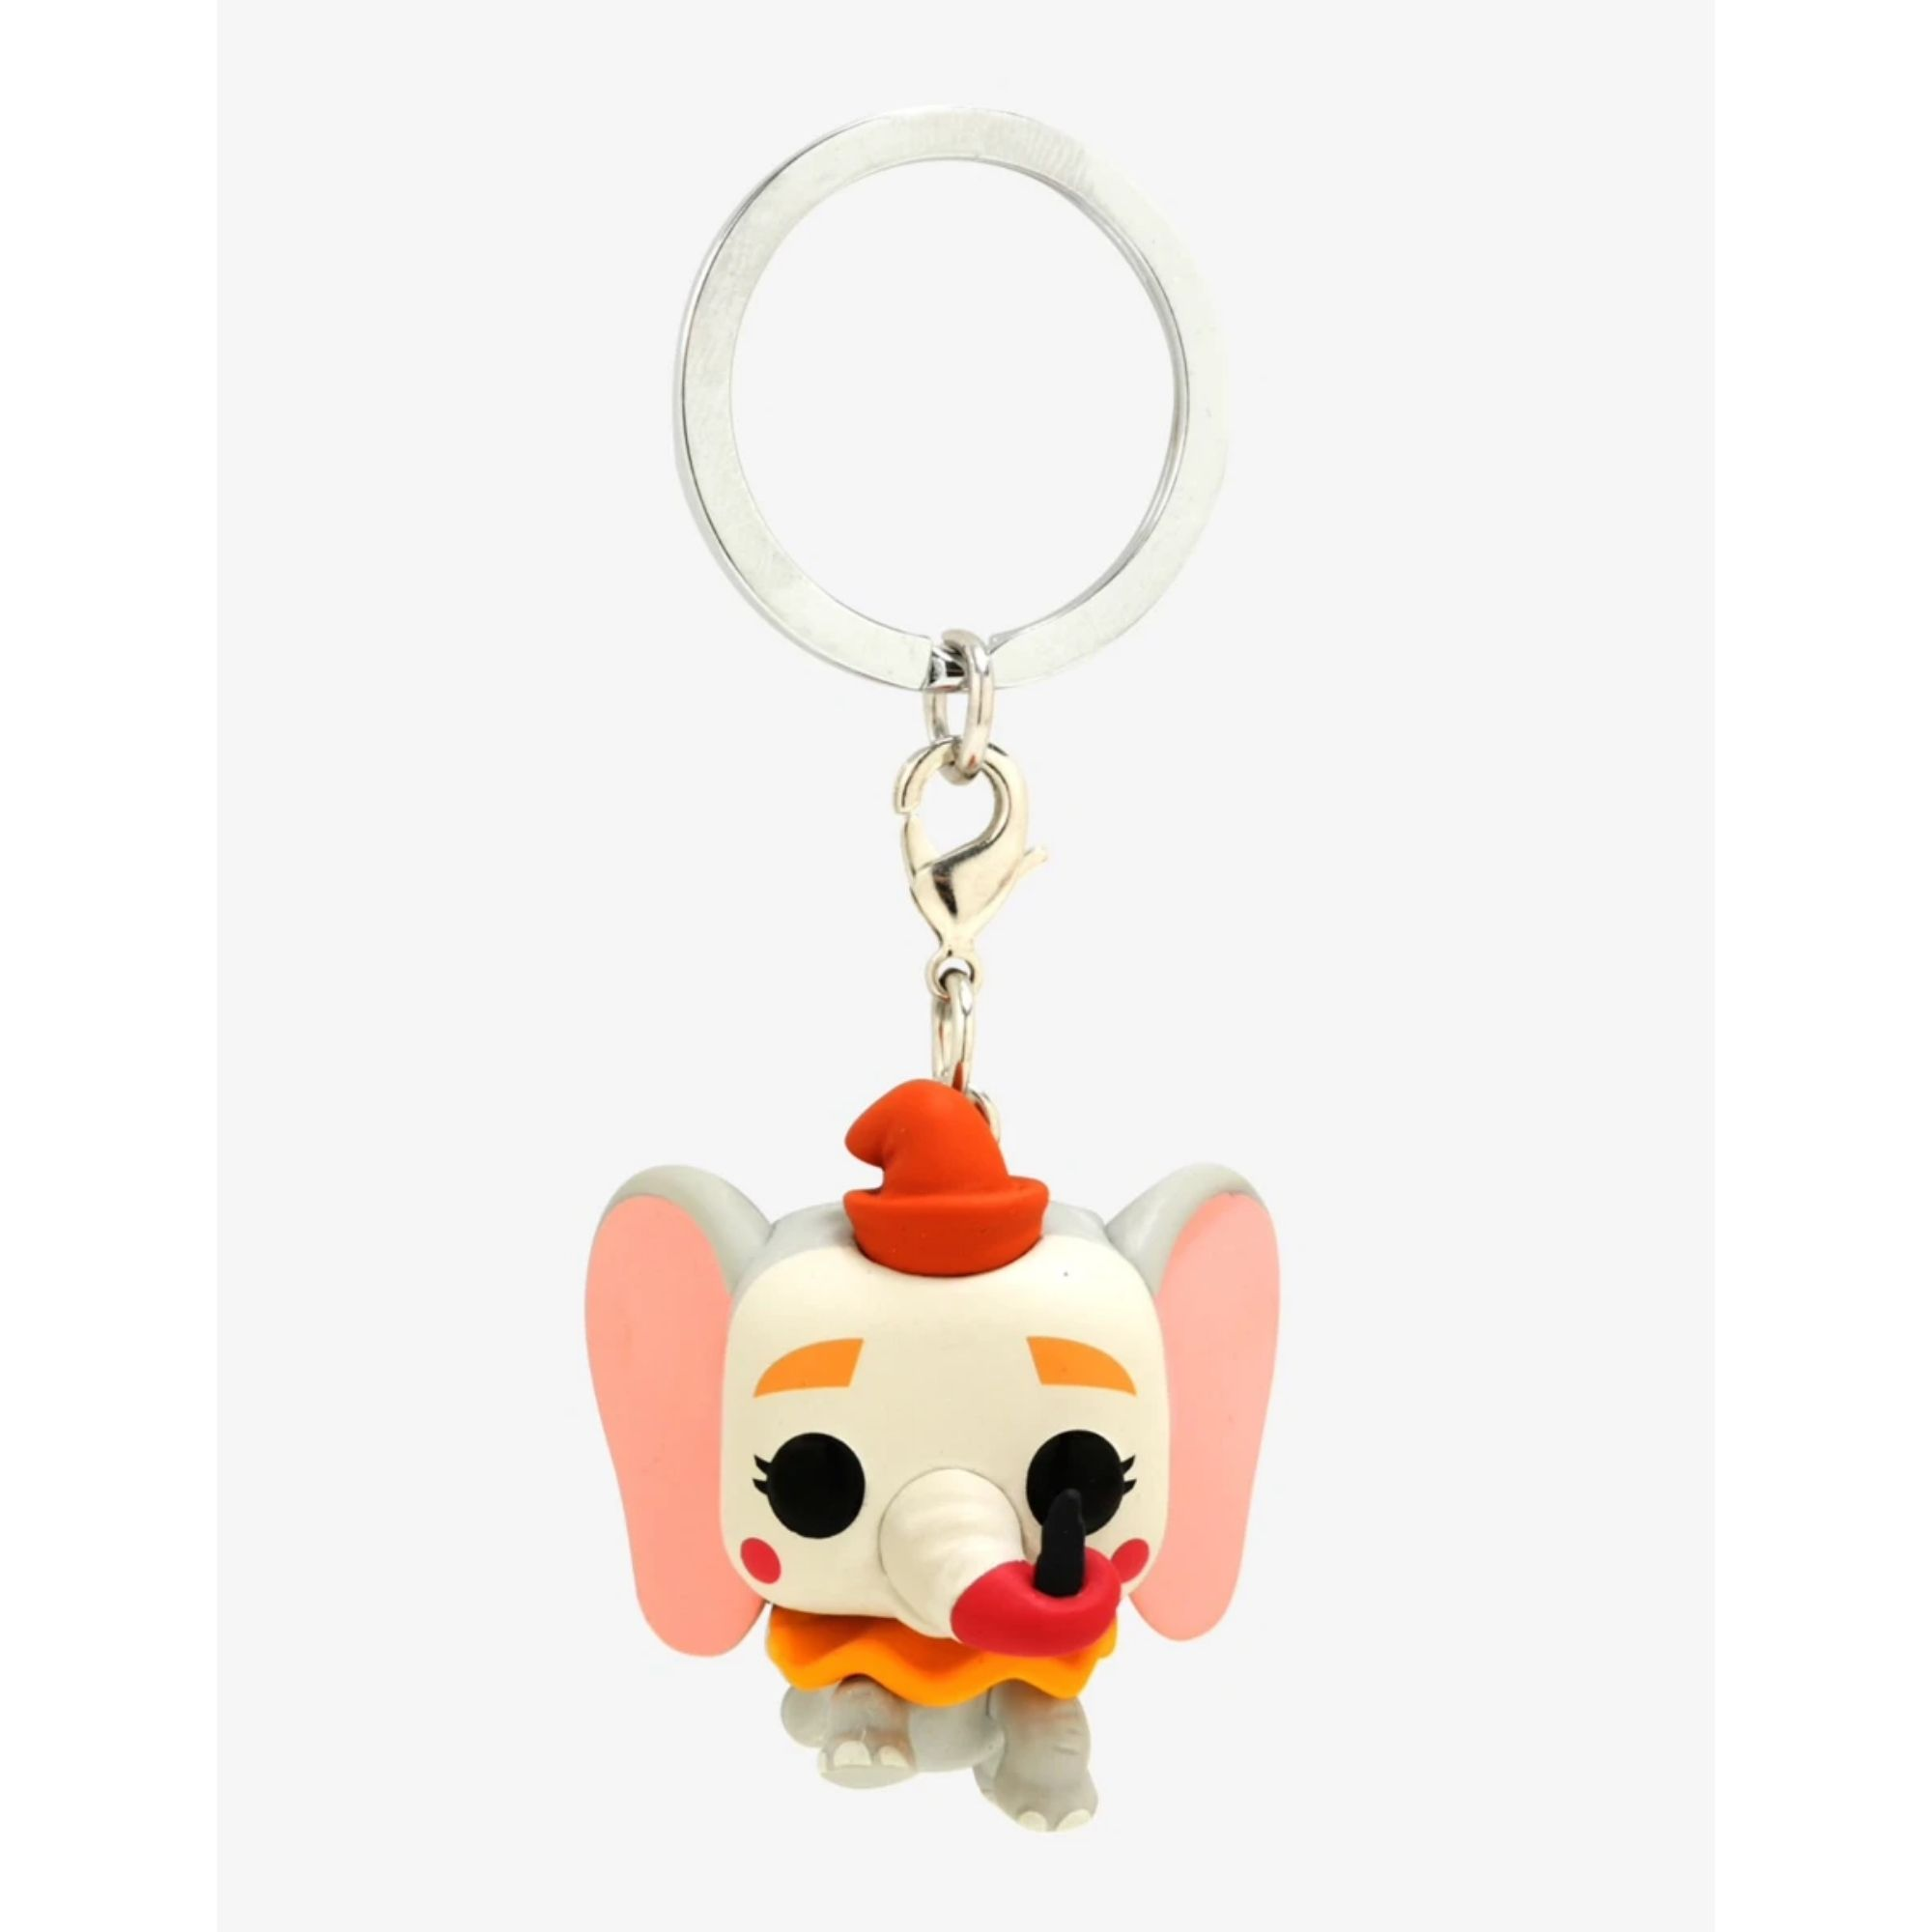 Disney Box Dumbo Funko Pop Exclusivo Hot Topic  - Game Land Brinquedos